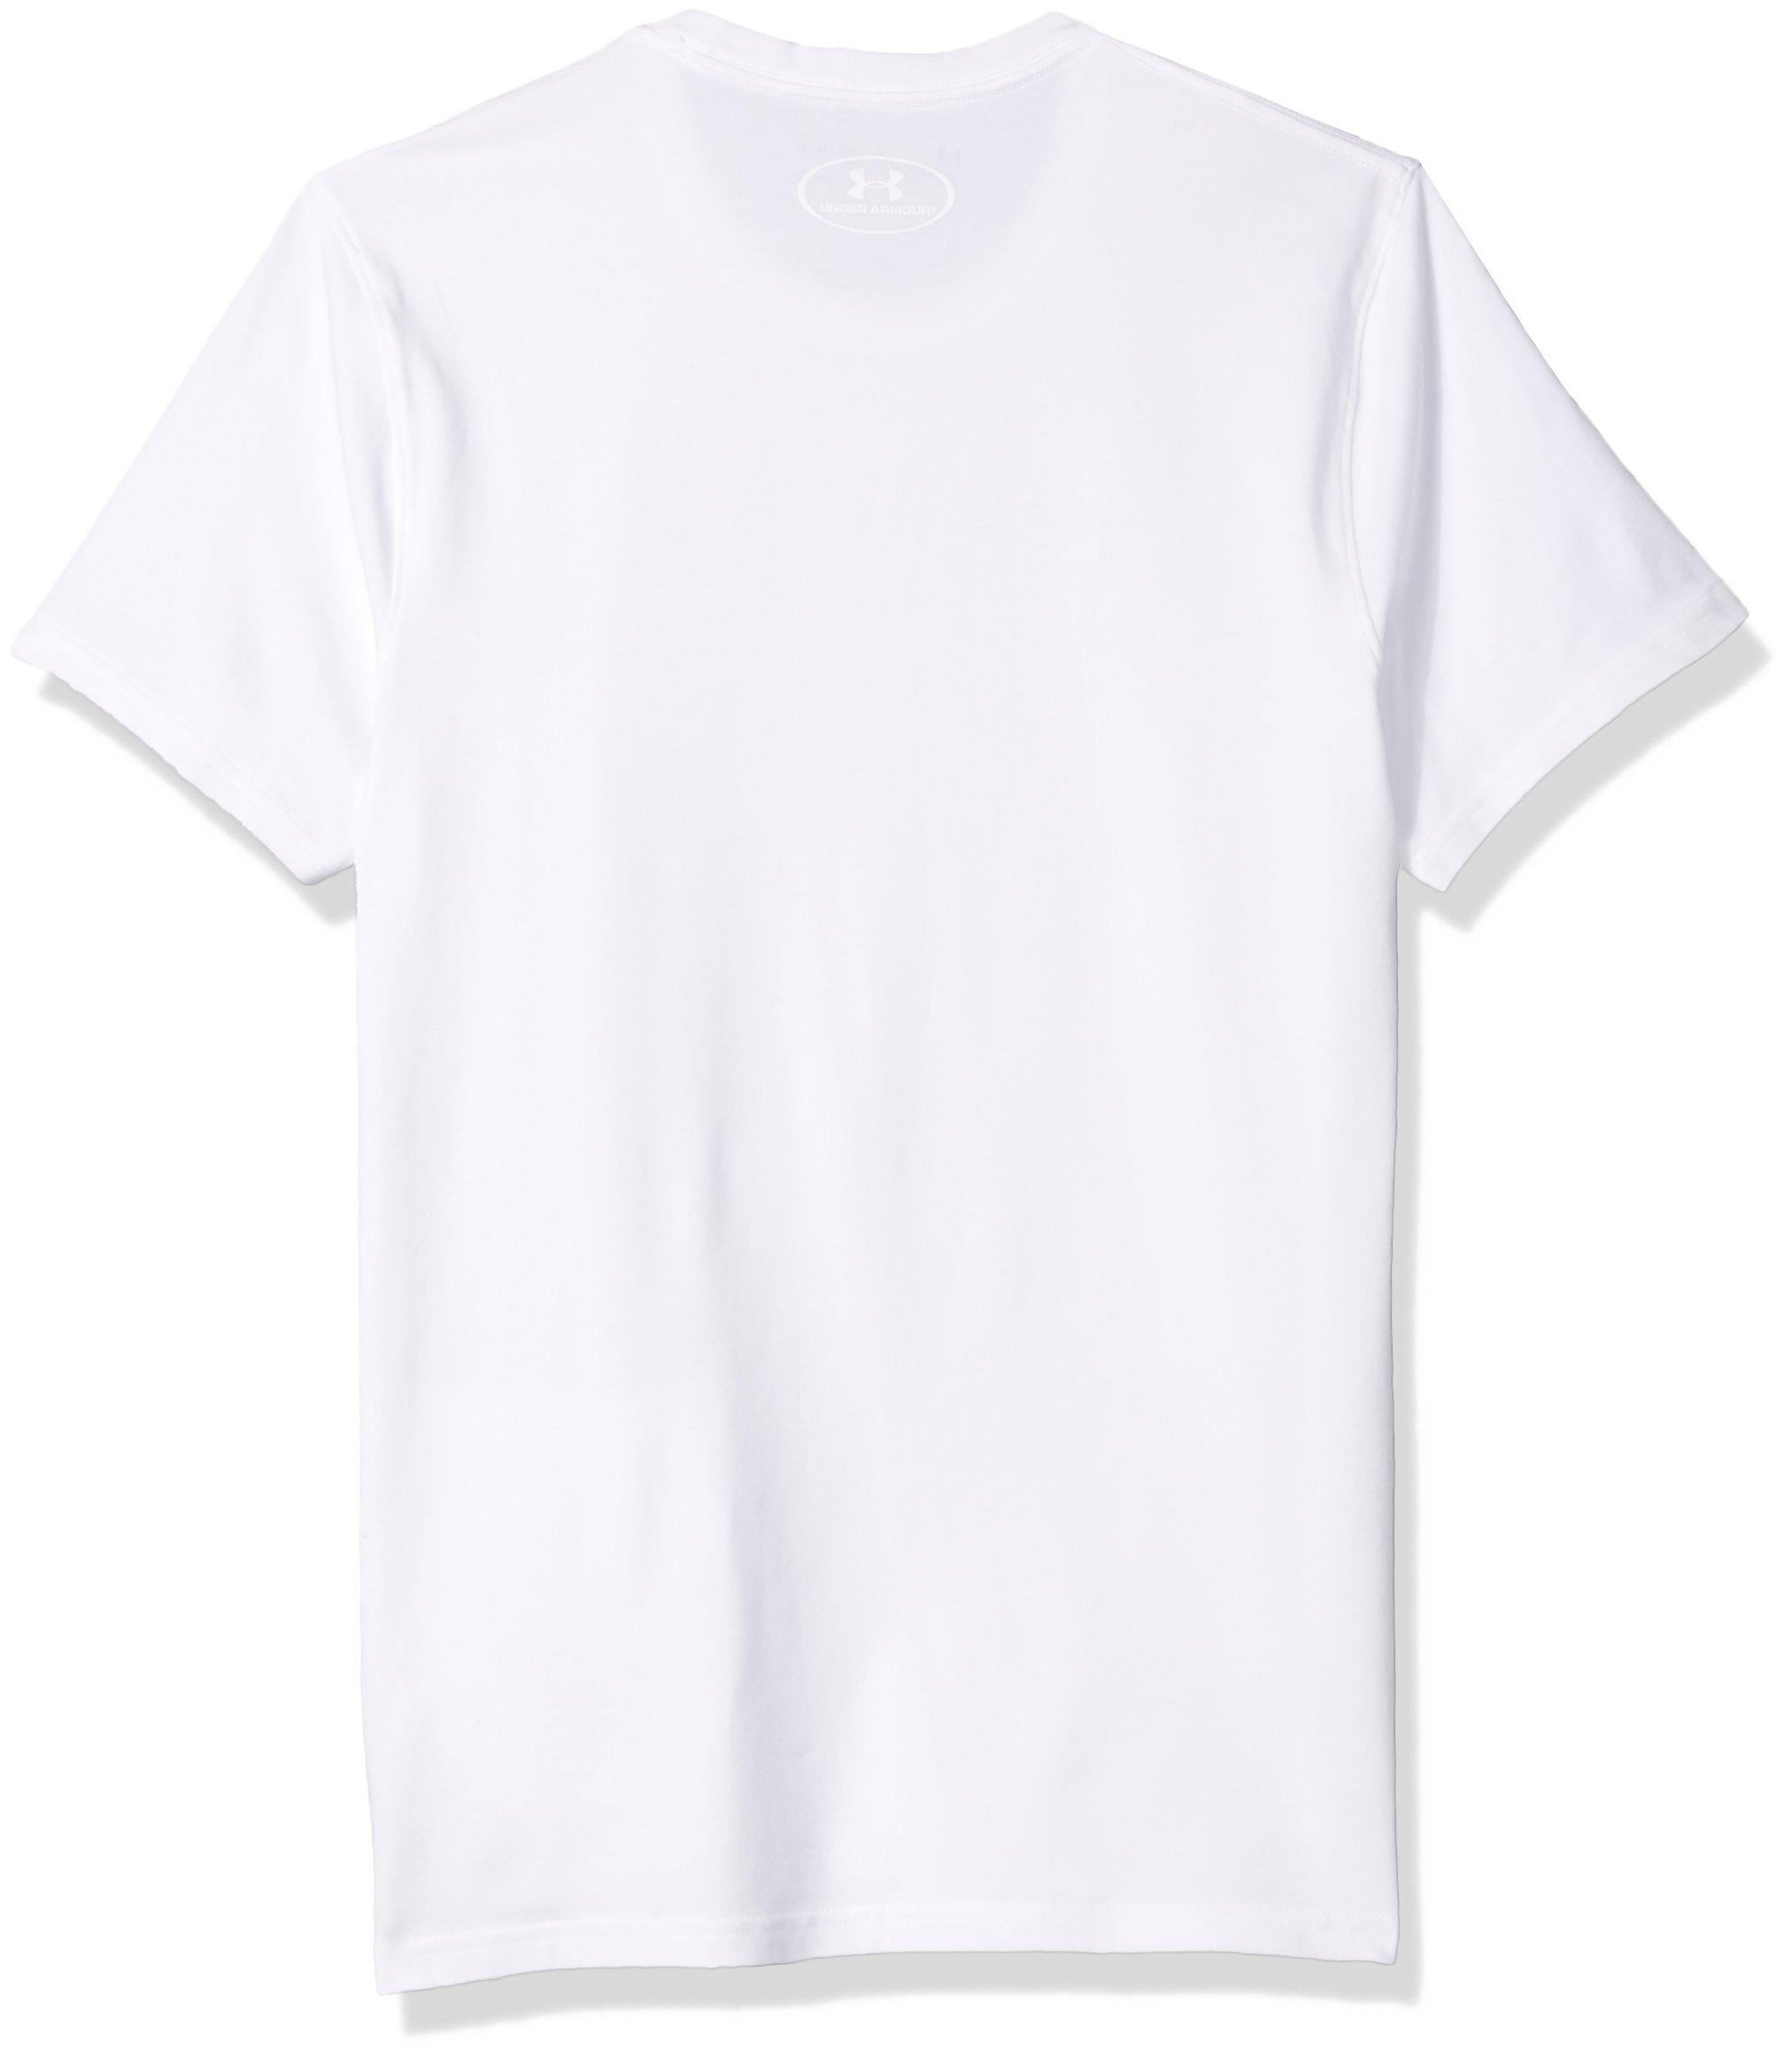 Under Armour Men's Cotton Stretch Crew Undershirt – 2-Pack,White (100)/White, Medium by Under Armour (Image #2)